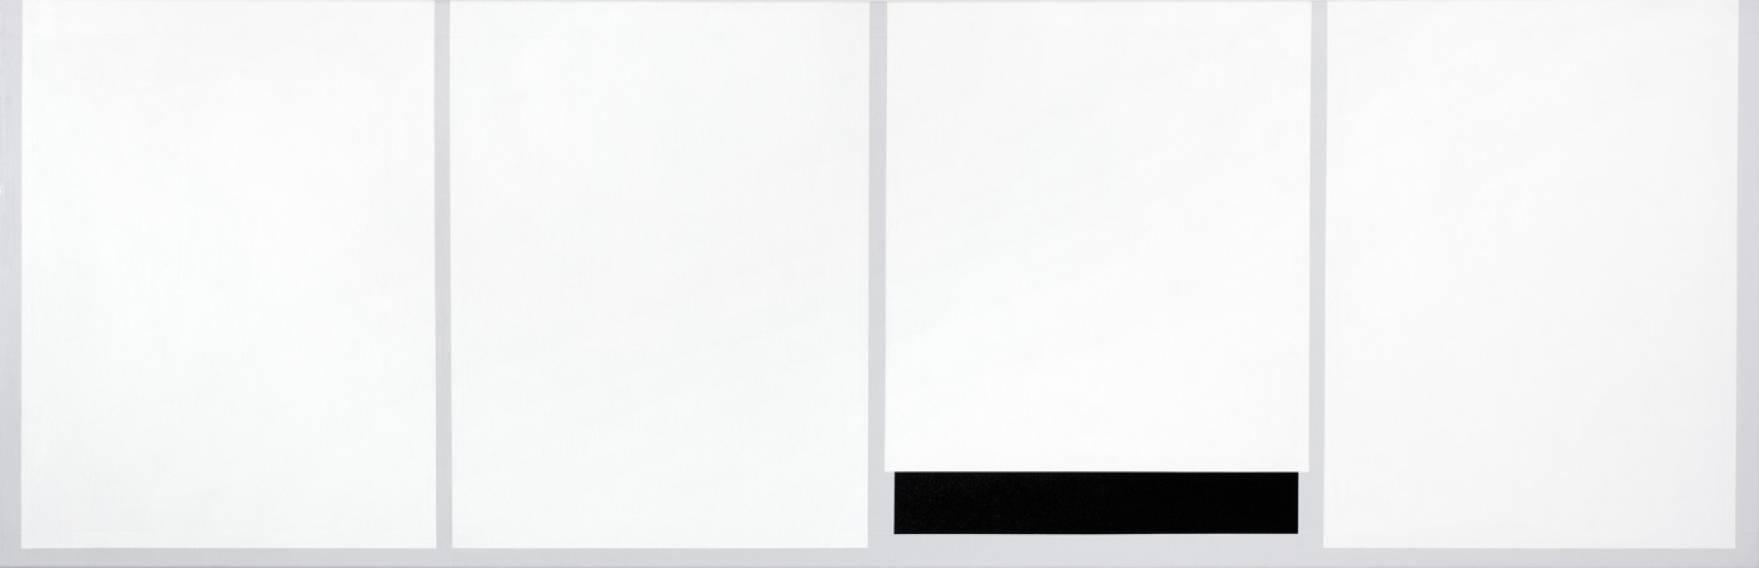 graphic art, stylish, trendy, best art online, aesthetic, minimalist painting, single,